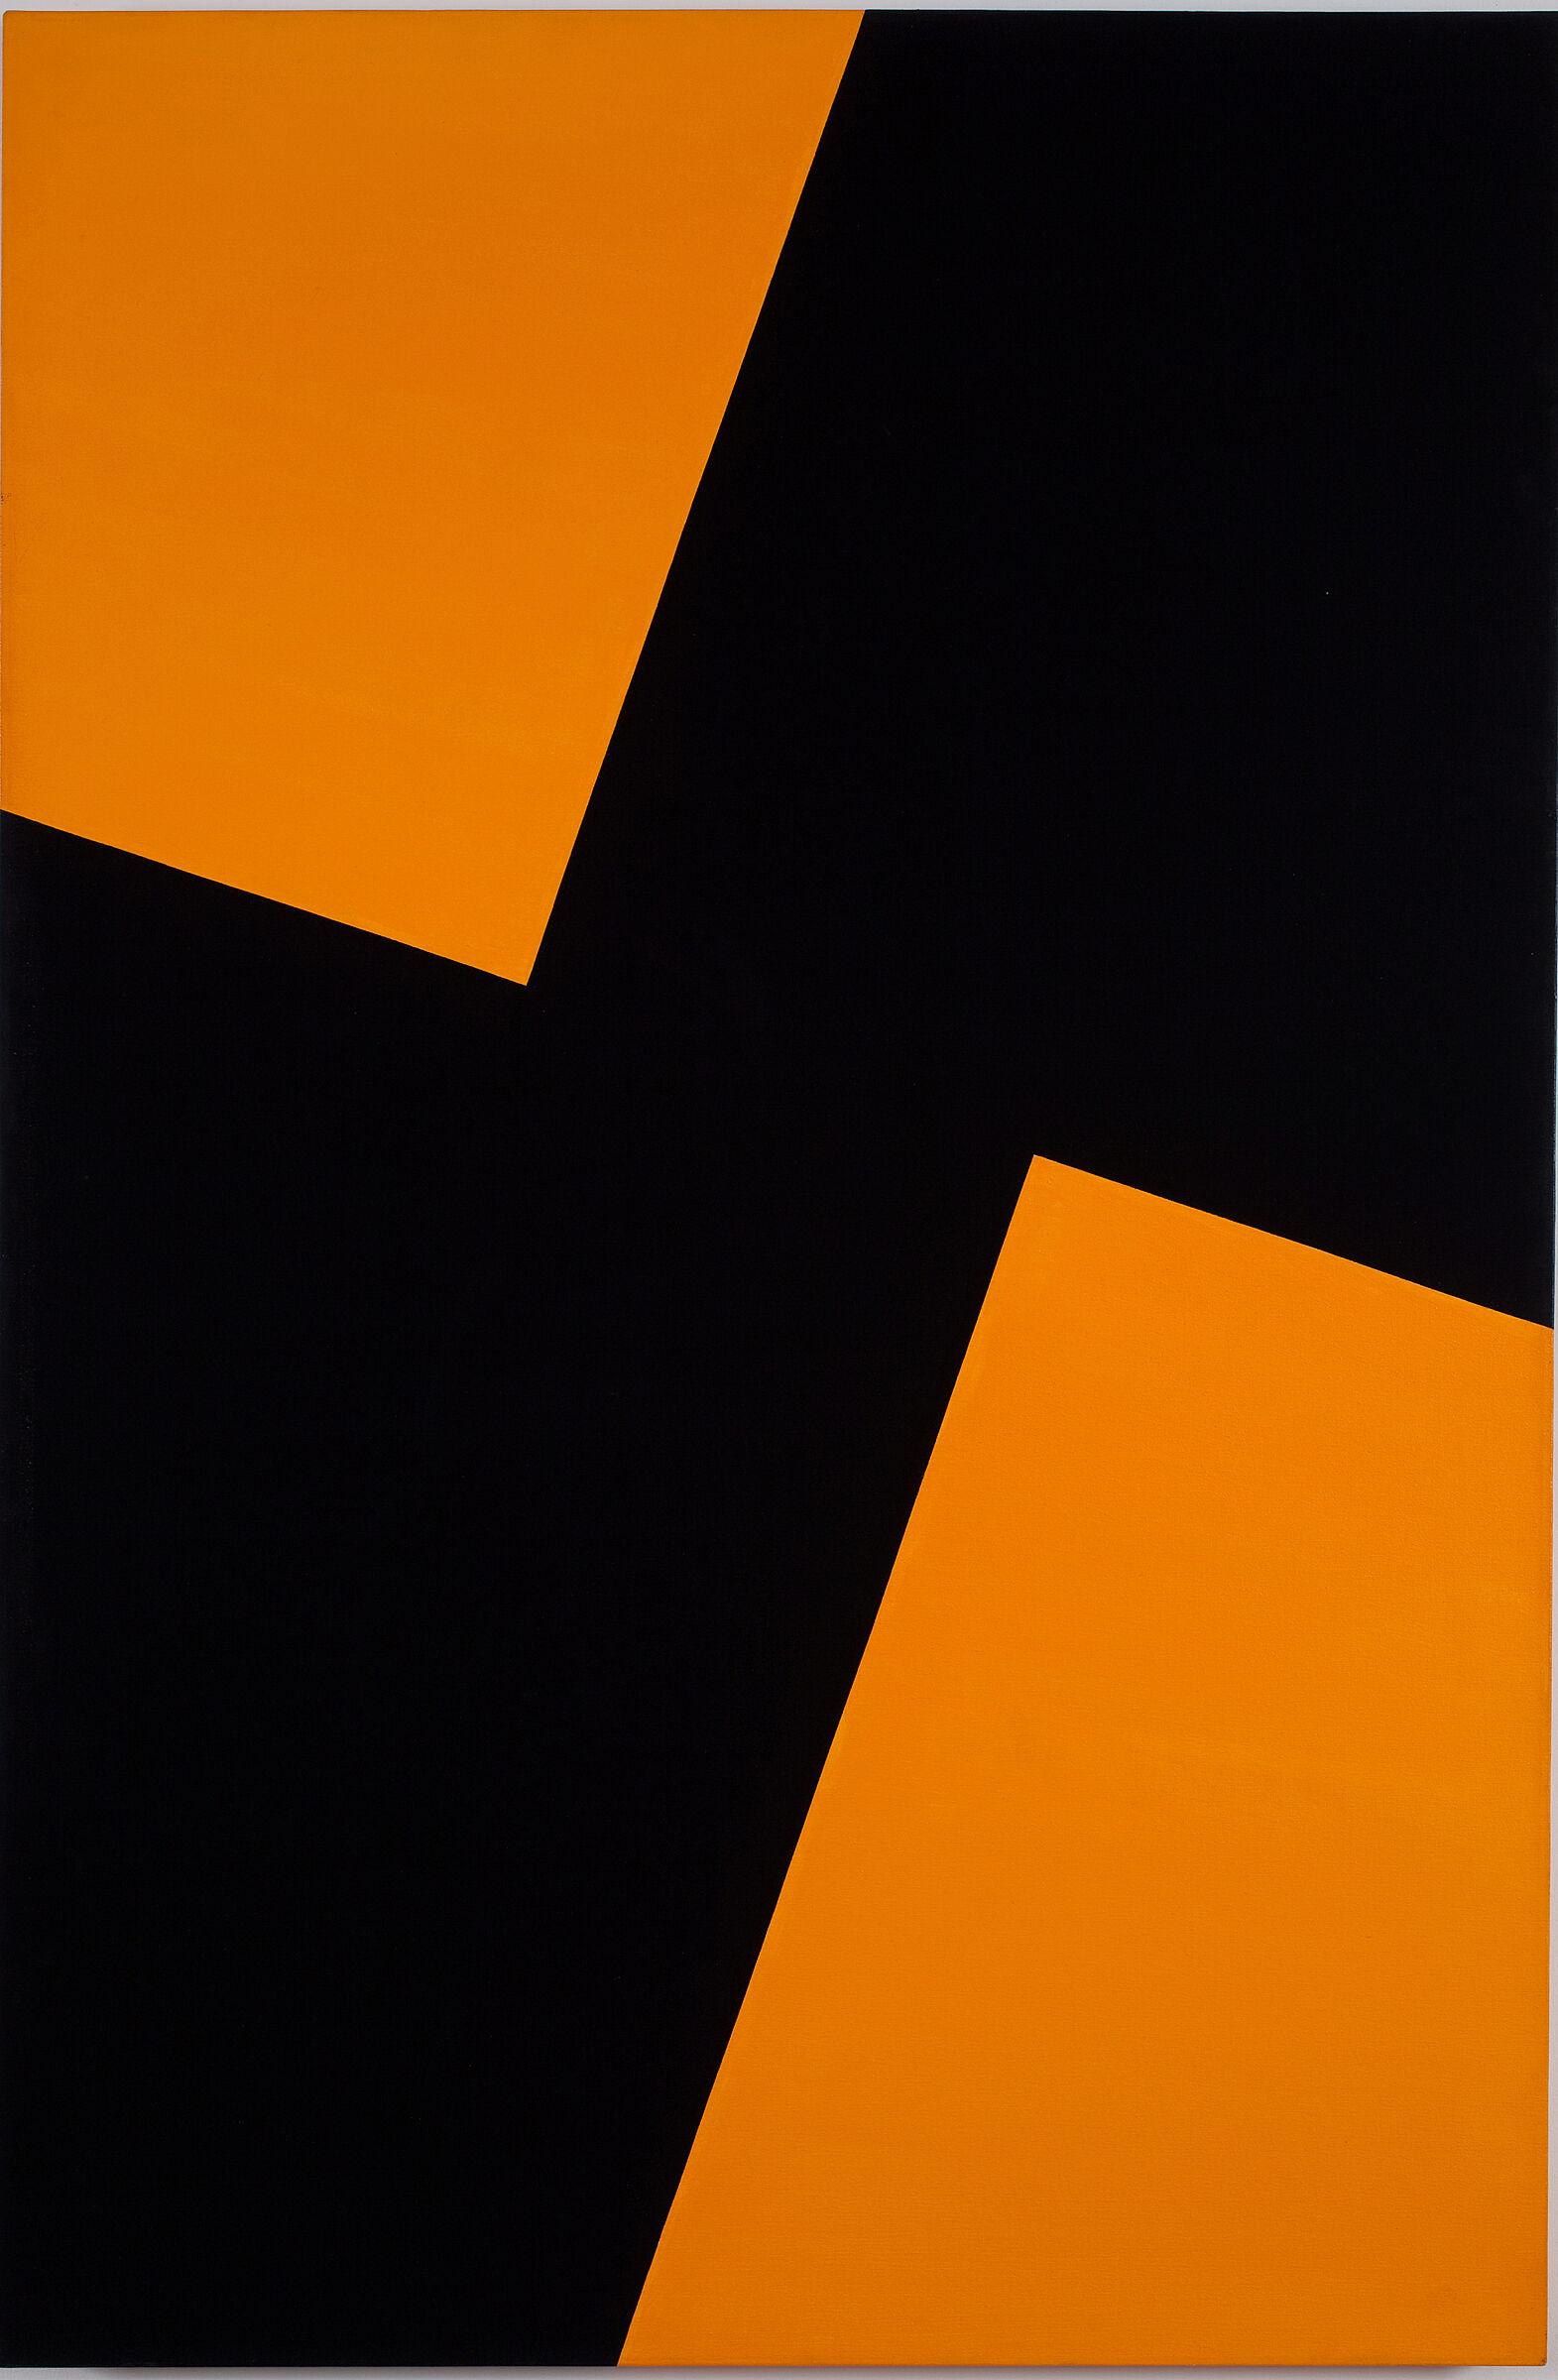 A black and orange artwork by Carmen Herrera.